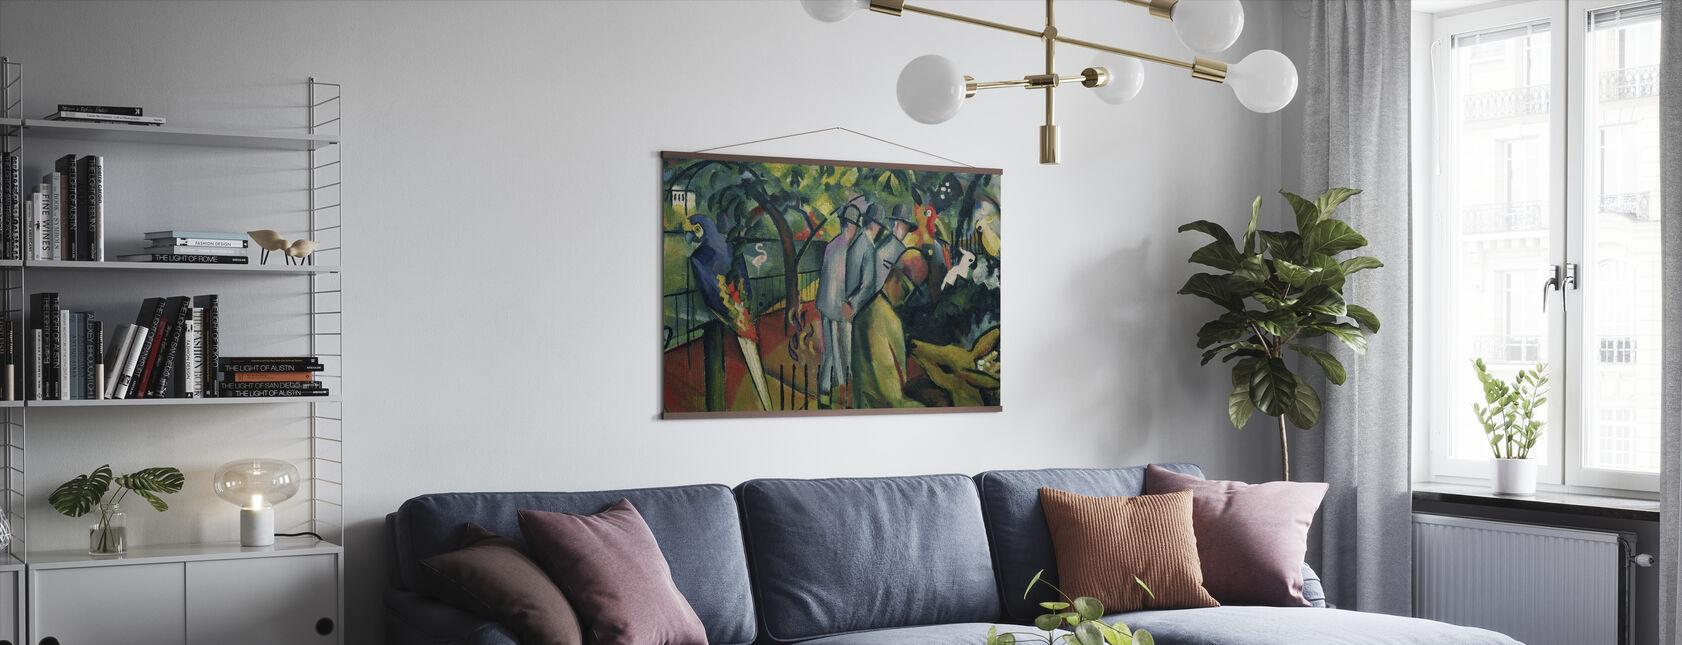 August Macke - Plakat - Stue